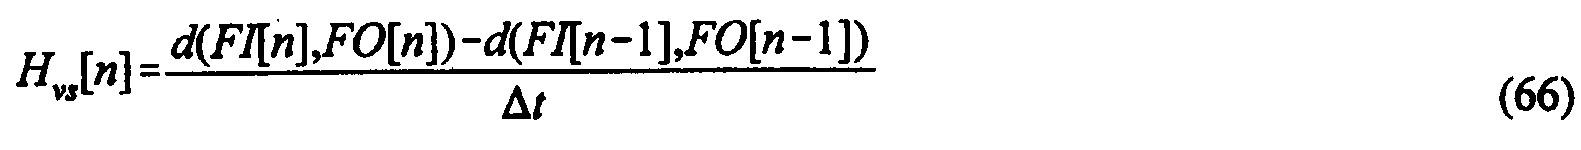 Figure 112006089528169-pct00135